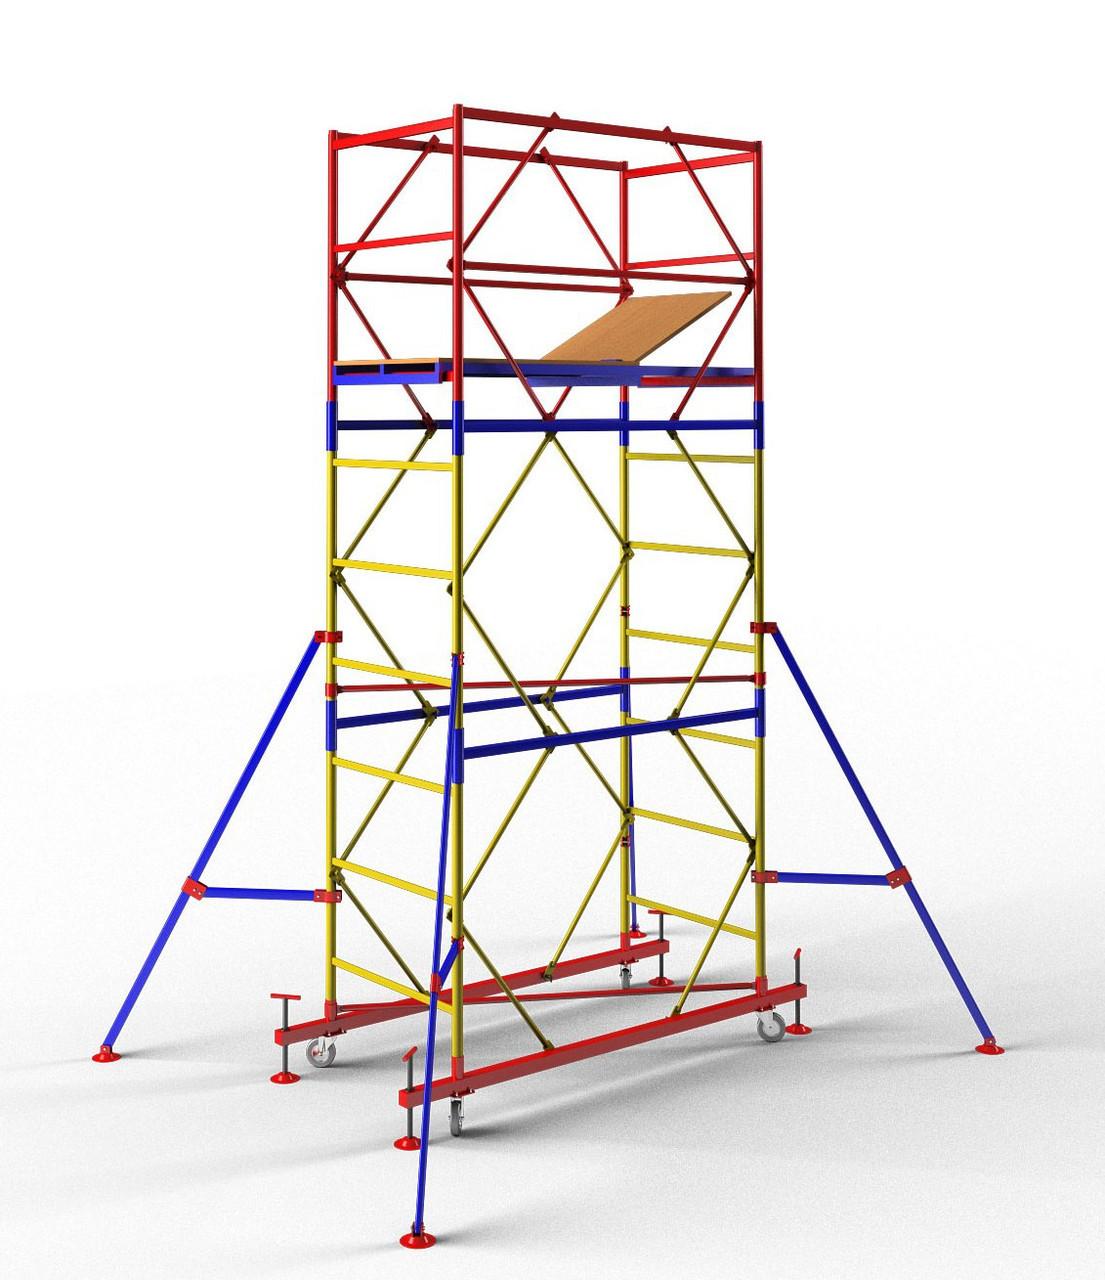 Вышка-тура мобильная облегченная 1,2 х 2,0 м (11+1) Раб.высота 15,8 м